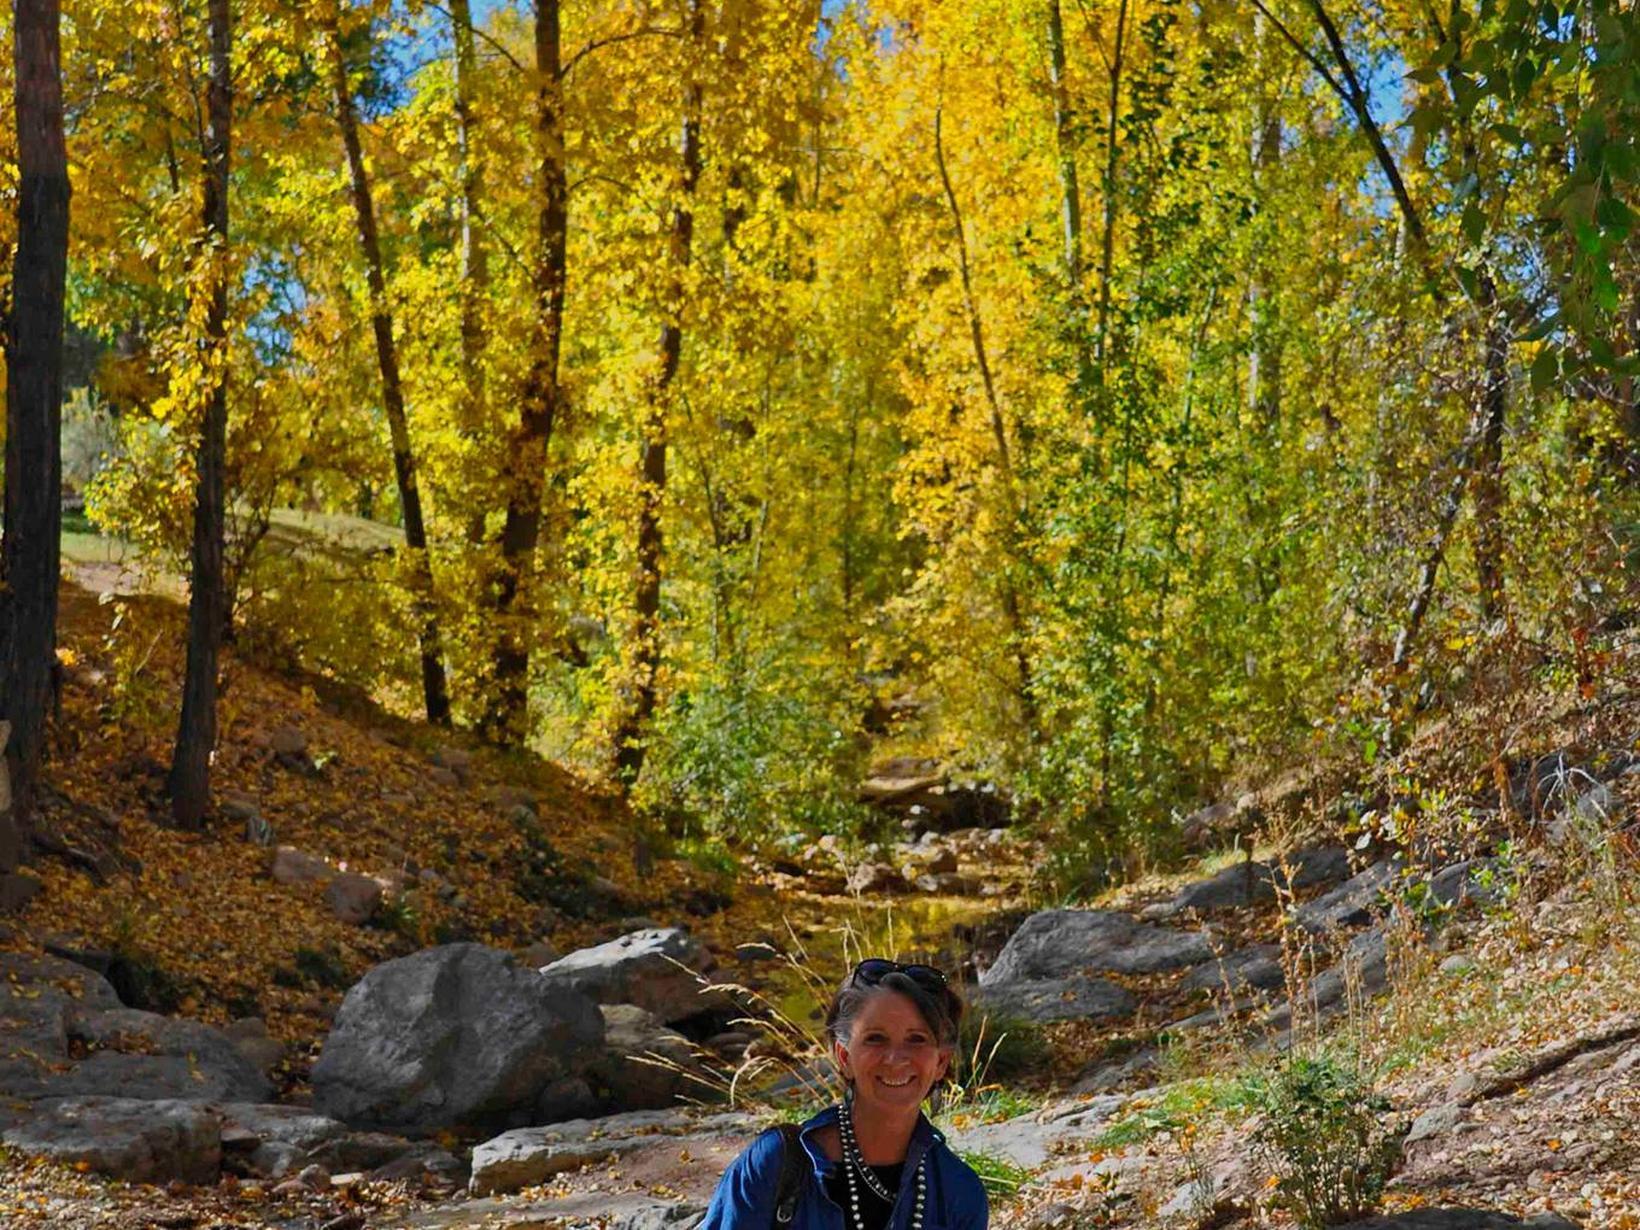 Nancy from Santa Fe, New Mexico, United States